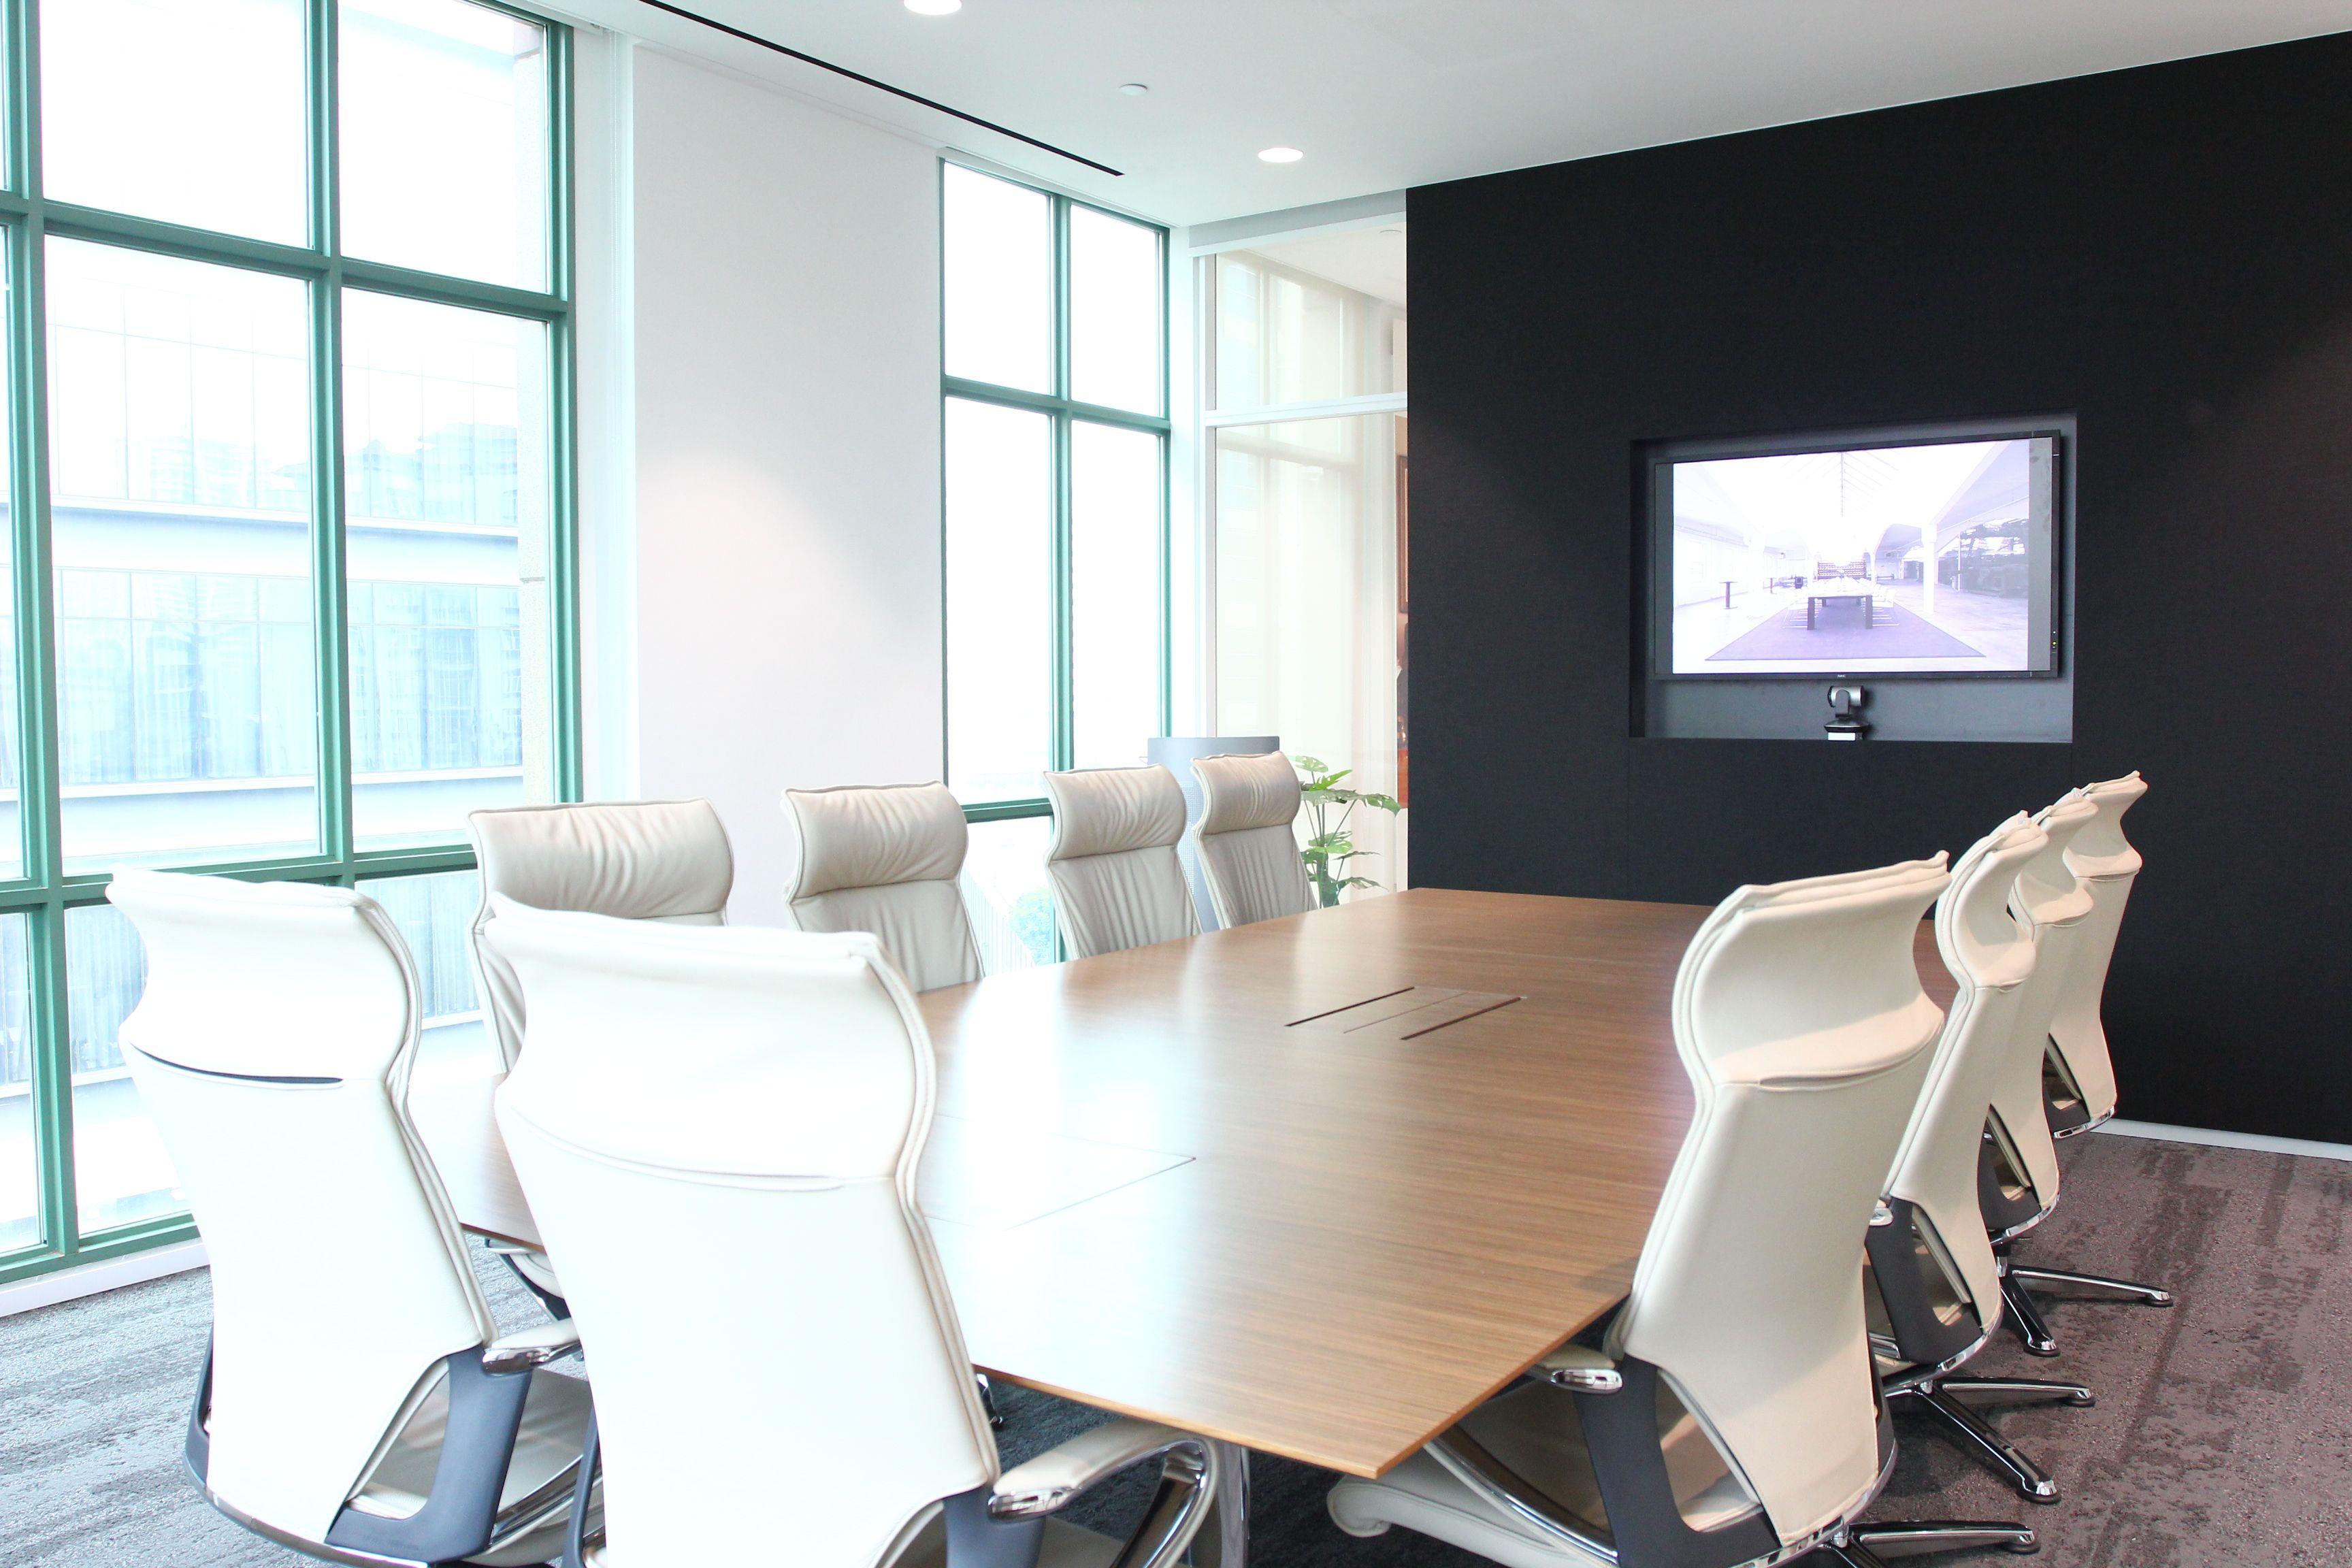 wilkhahn showroom singapore modus executive design klaus franck